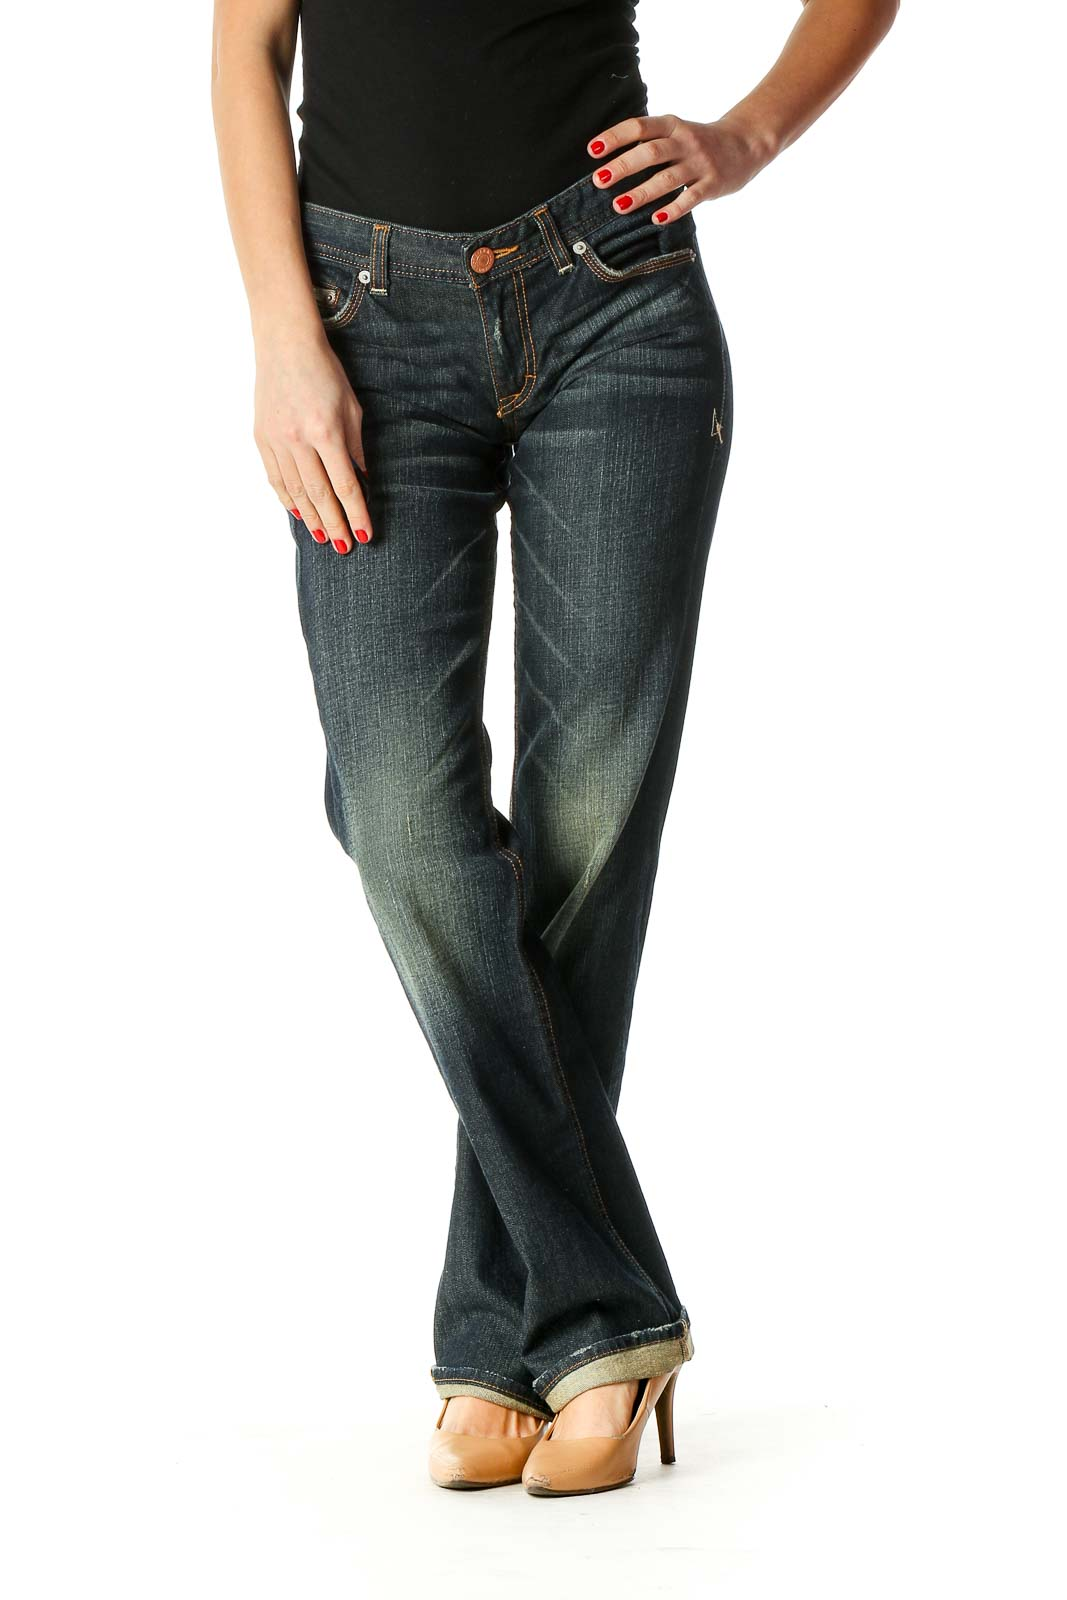 Blue Bootcut Jeans Front